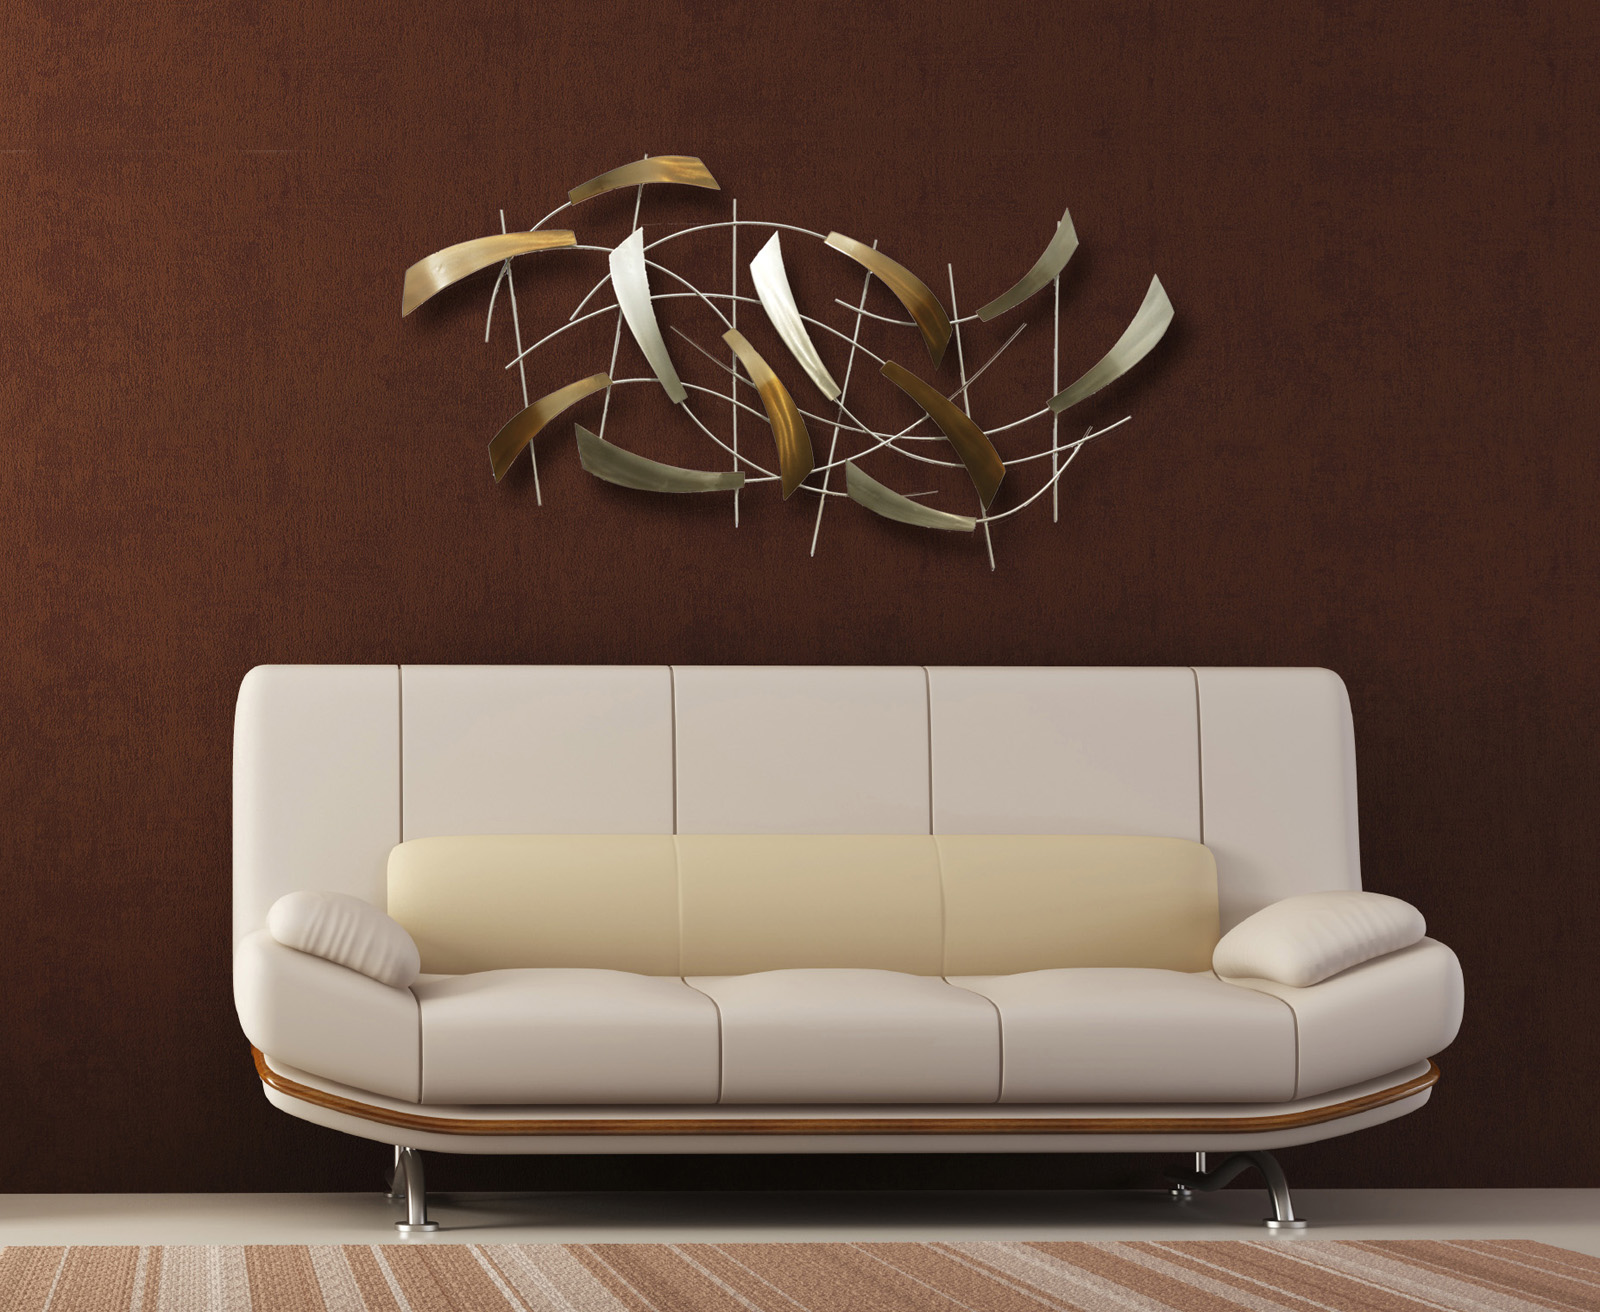 Home interiors and gifts - Home Interiors And Gifts Catalog 2011